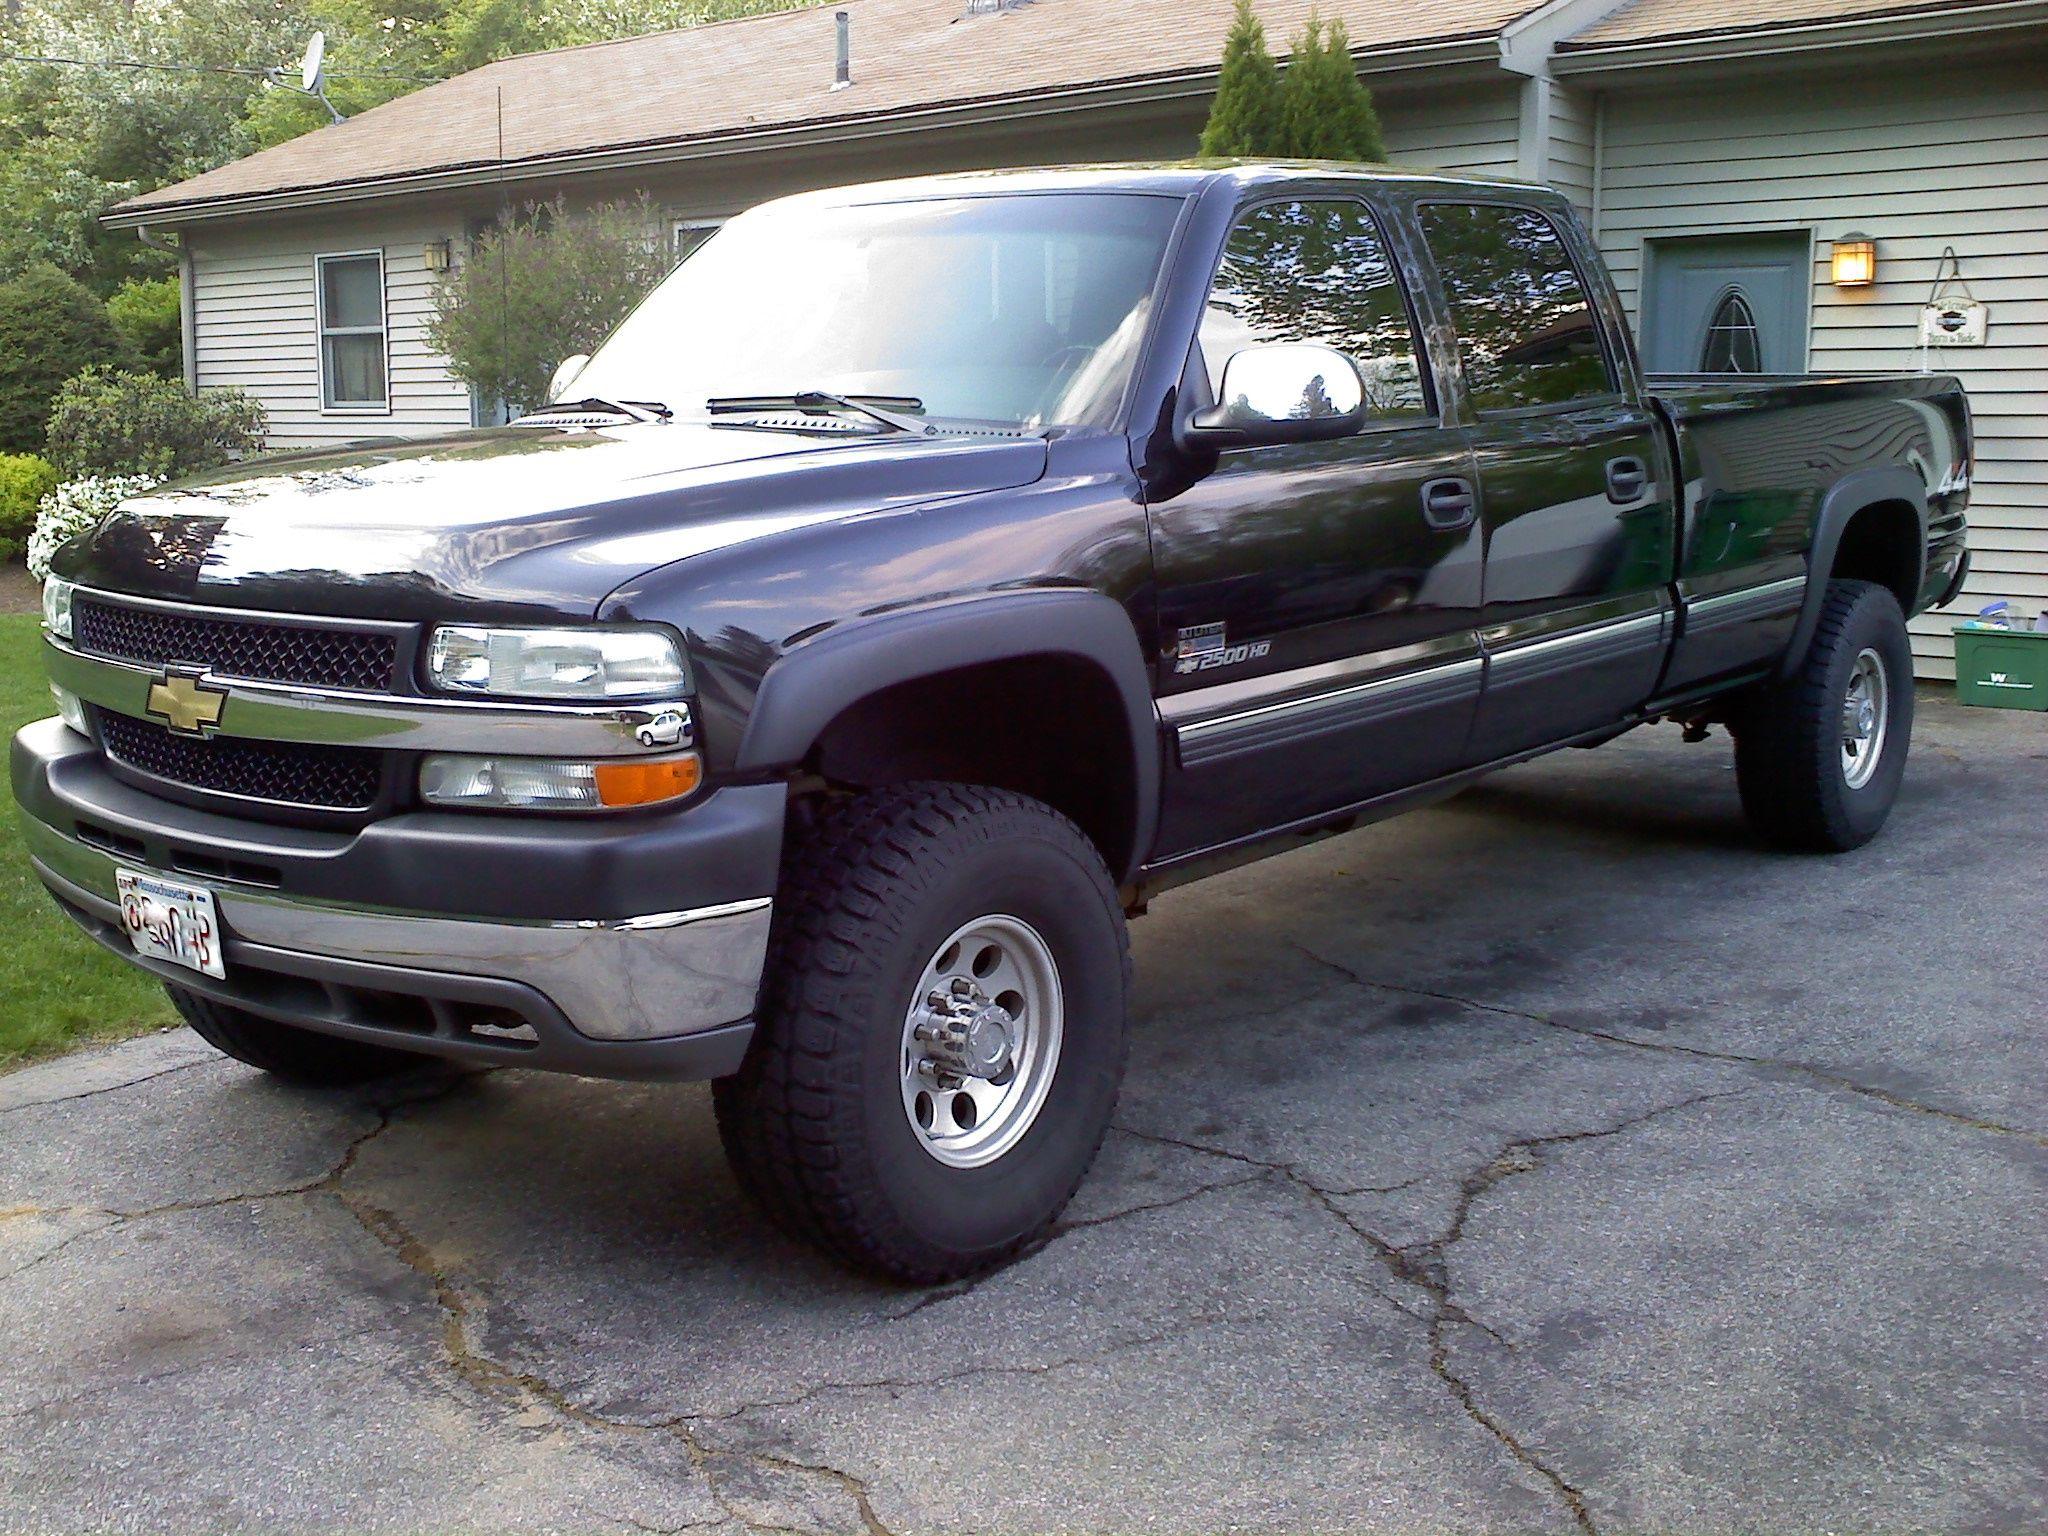 2002 Chevy Silverado 81L W Allison 5 Speed 35 Tires